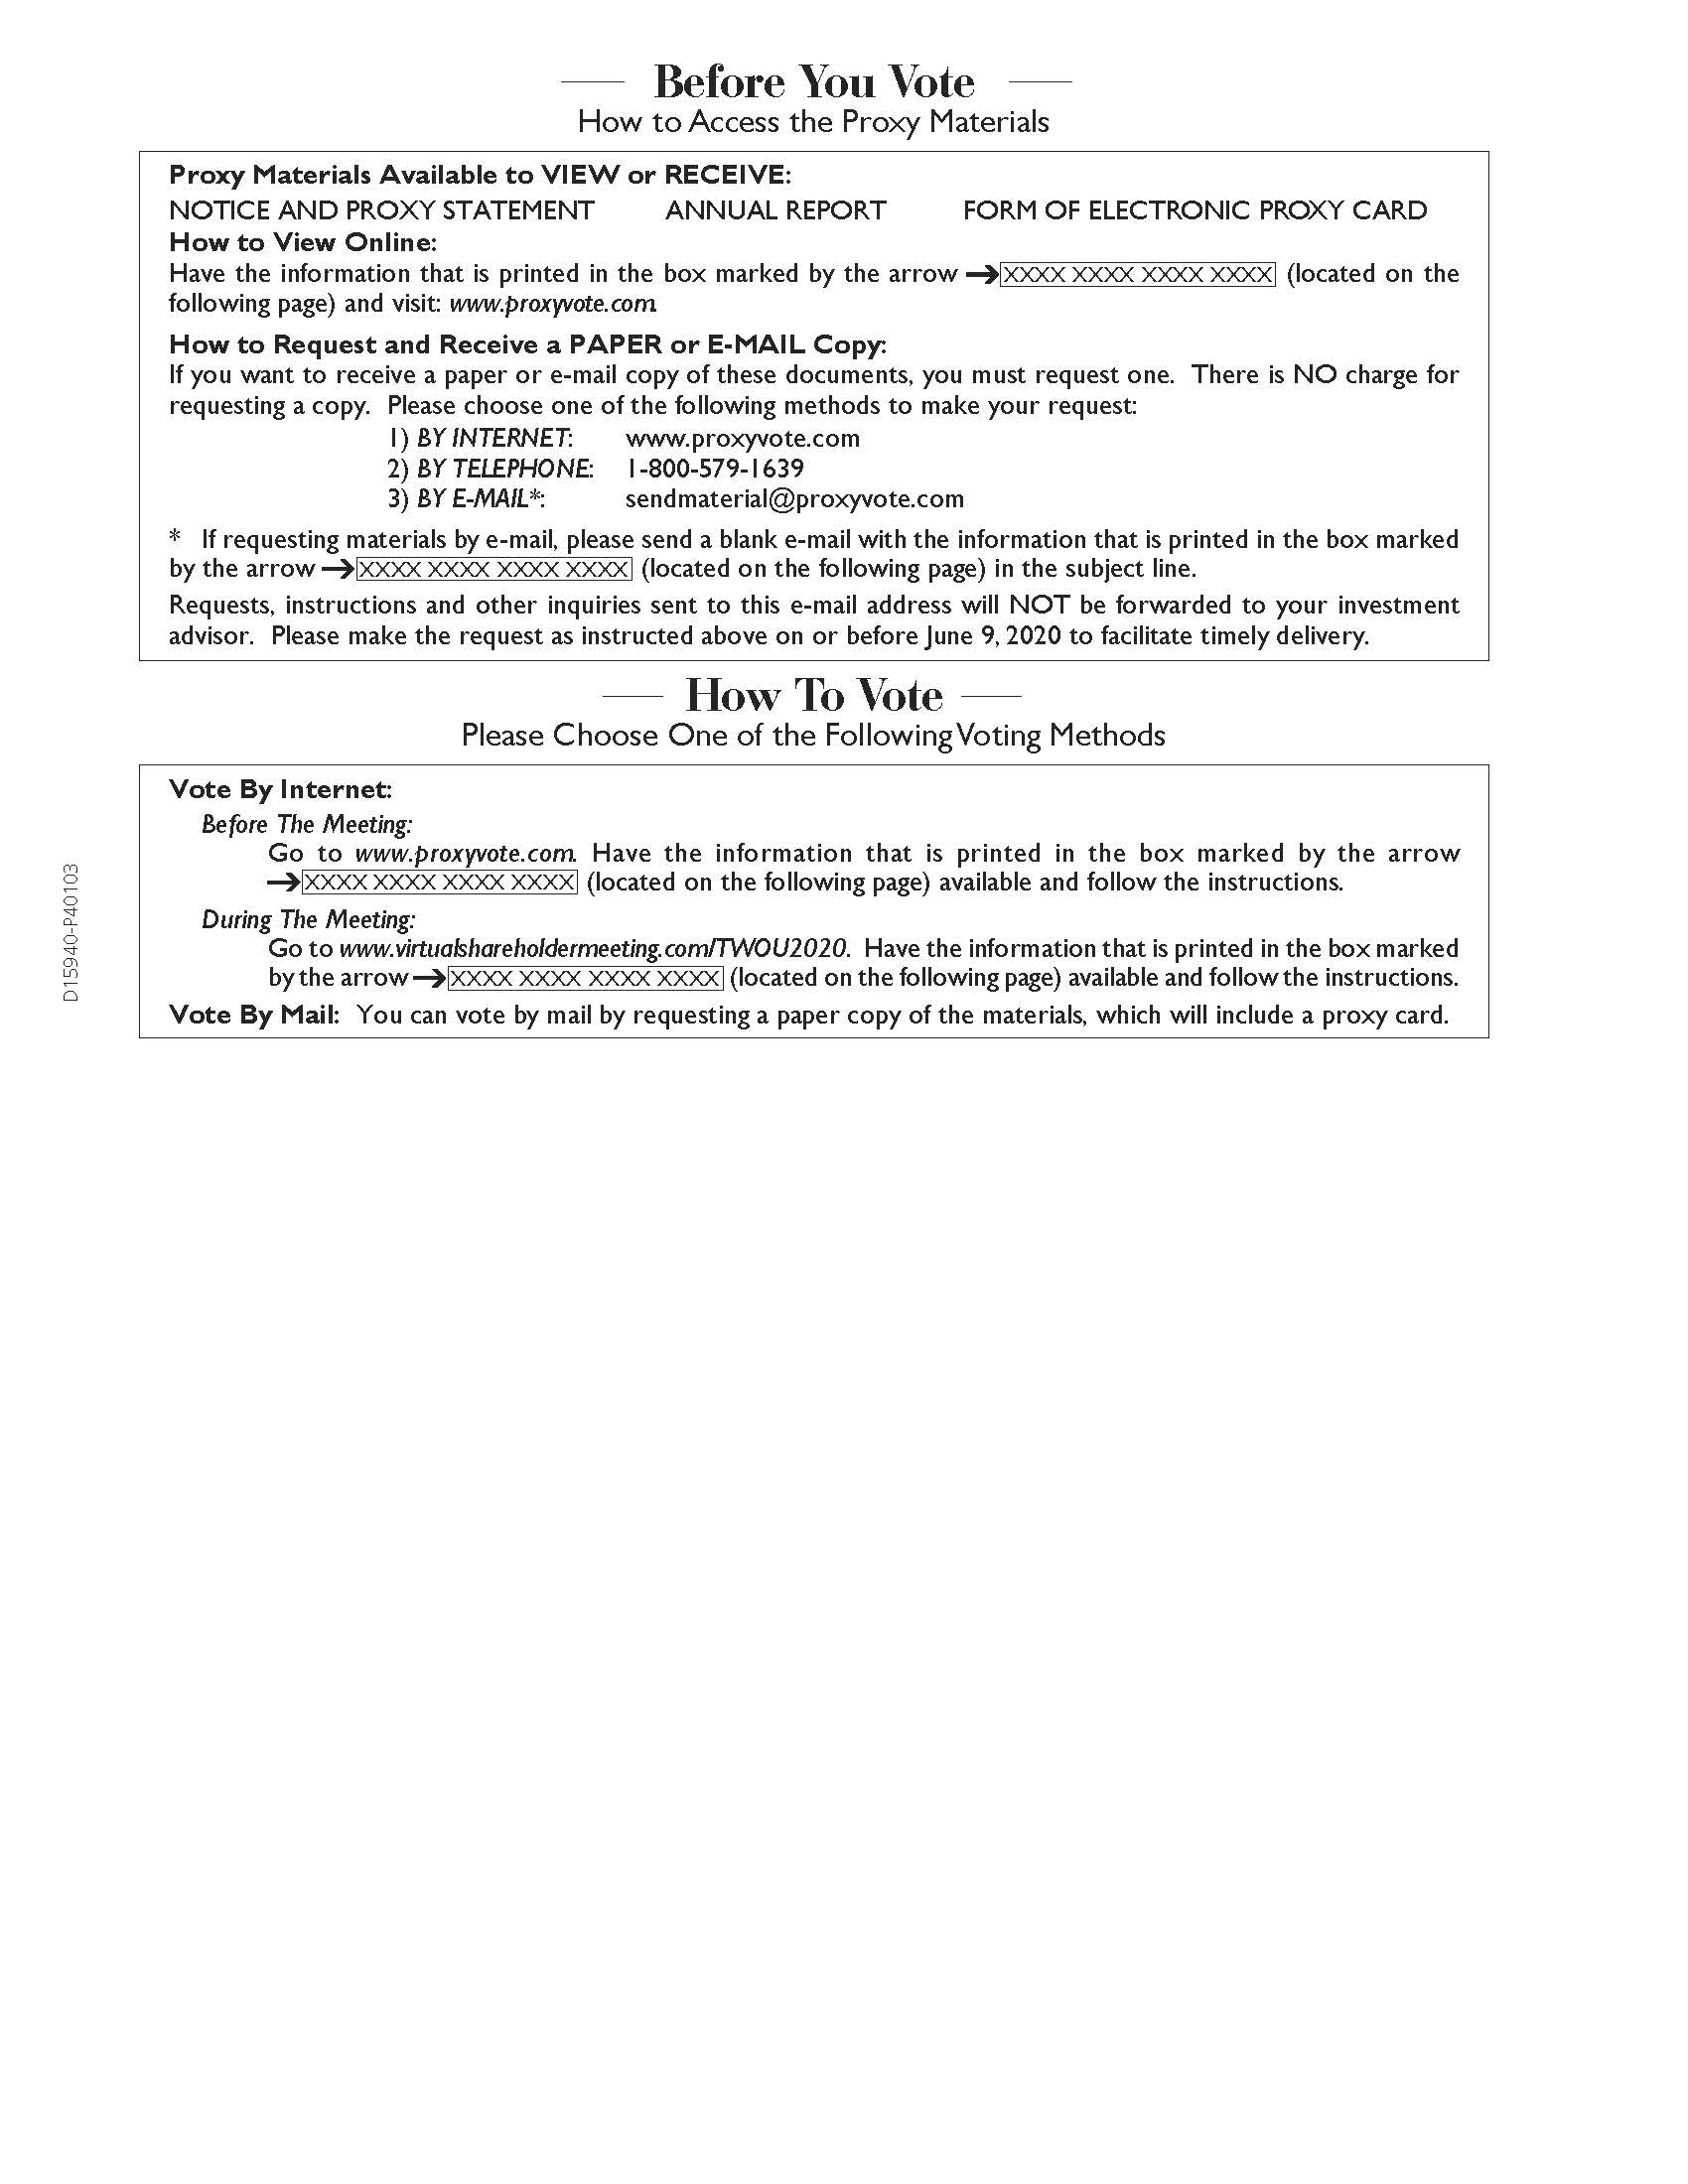 noticefinalapprovedpage2.jpg